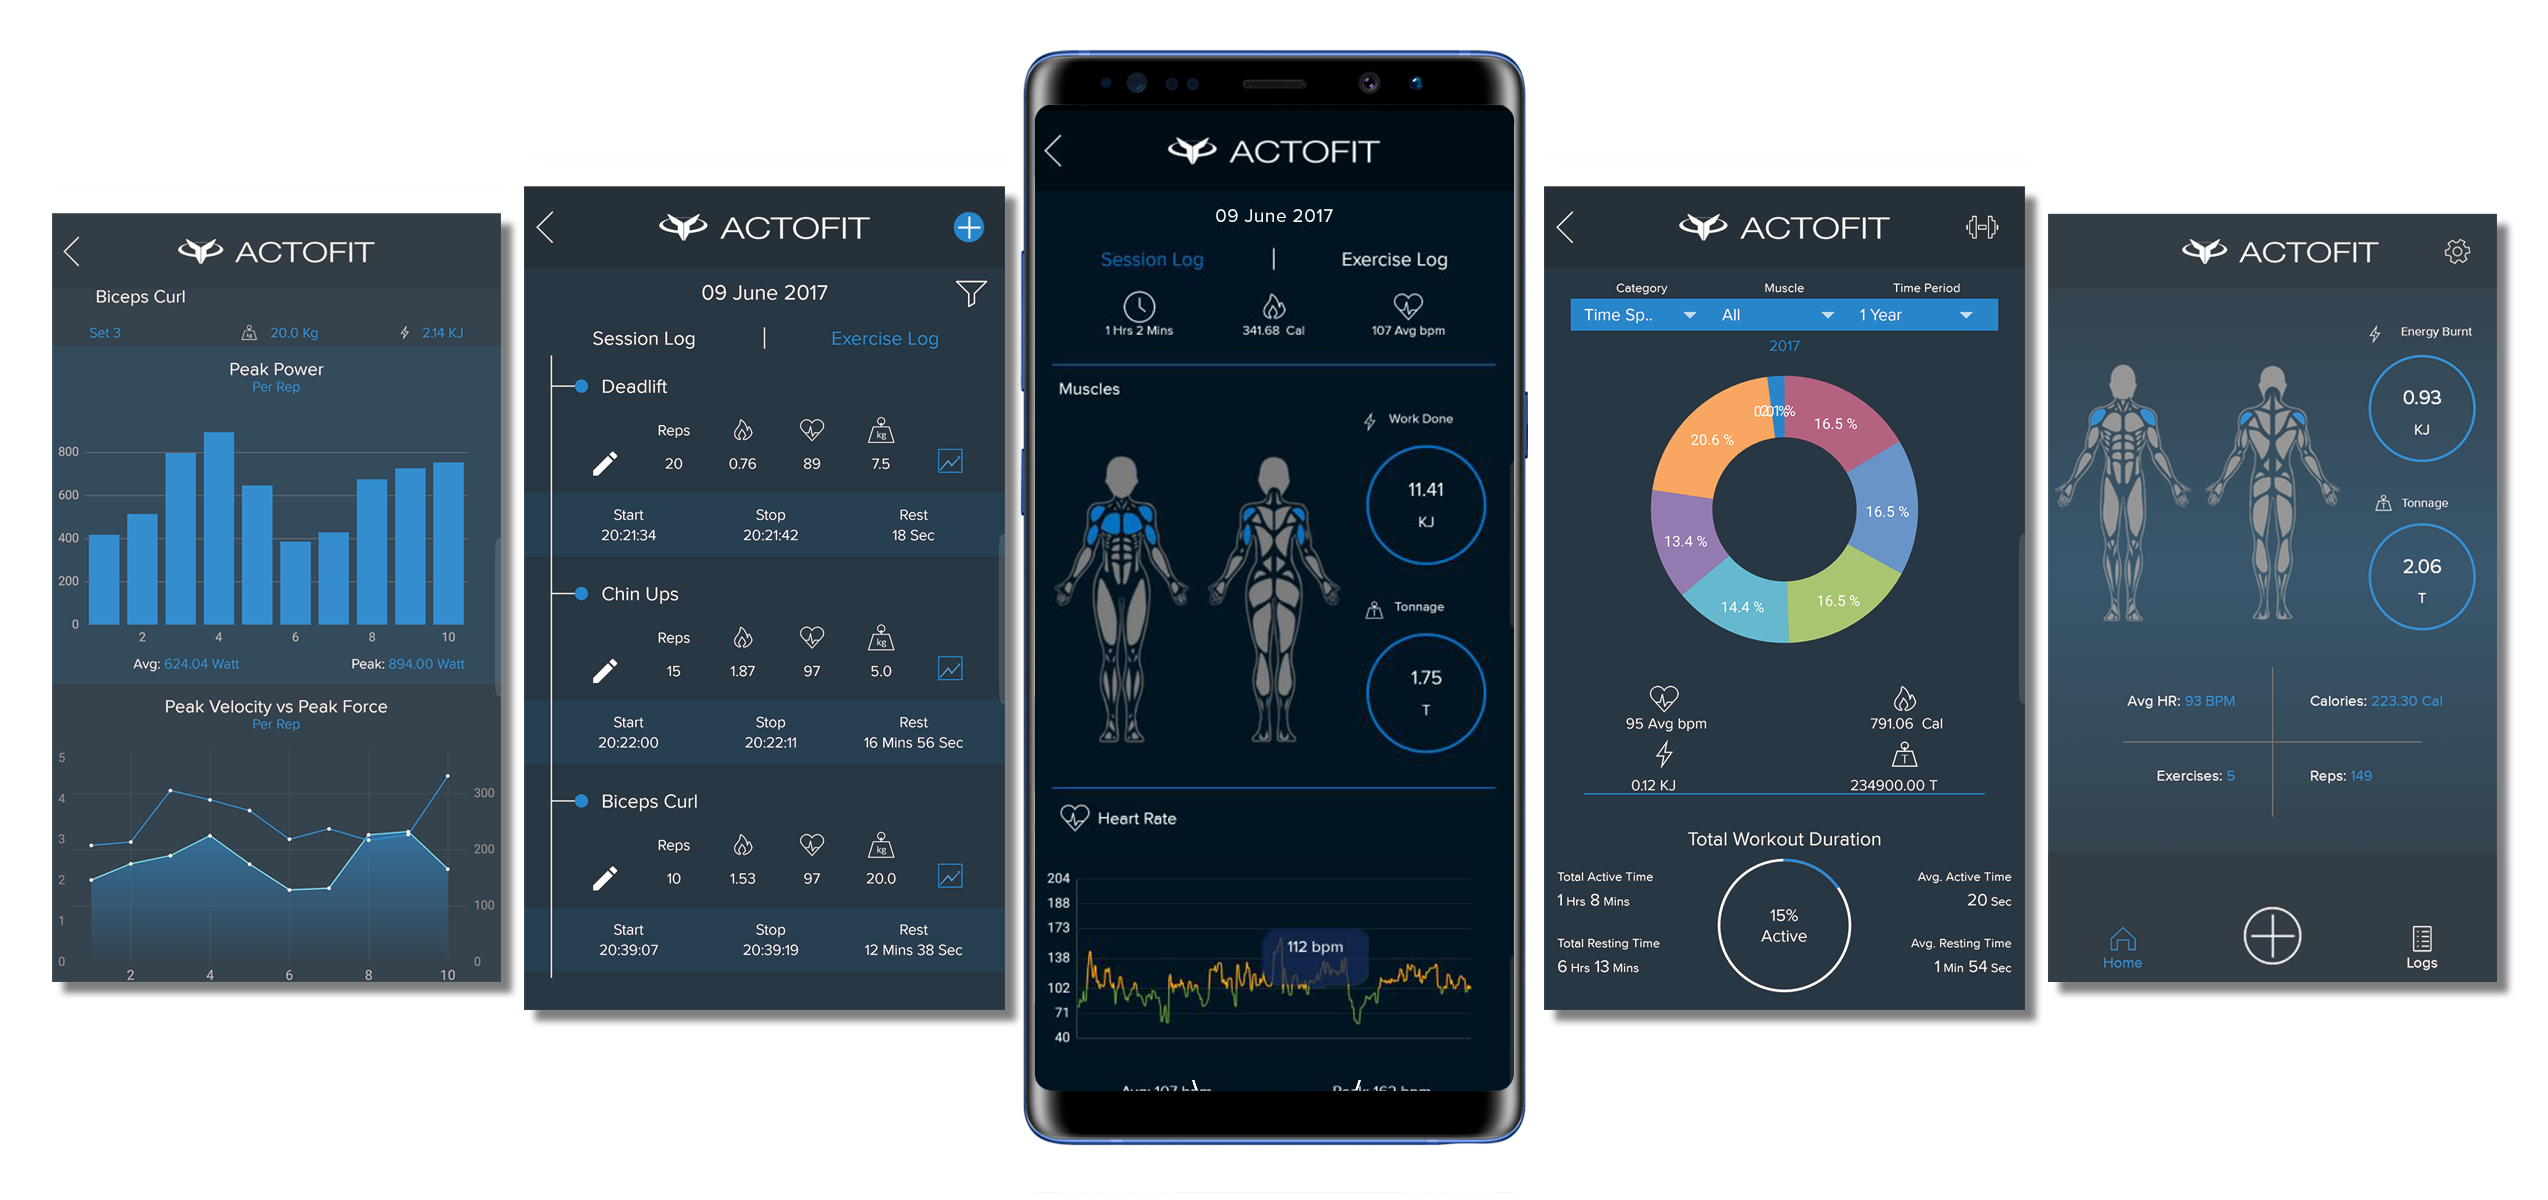 actofit smartphone application